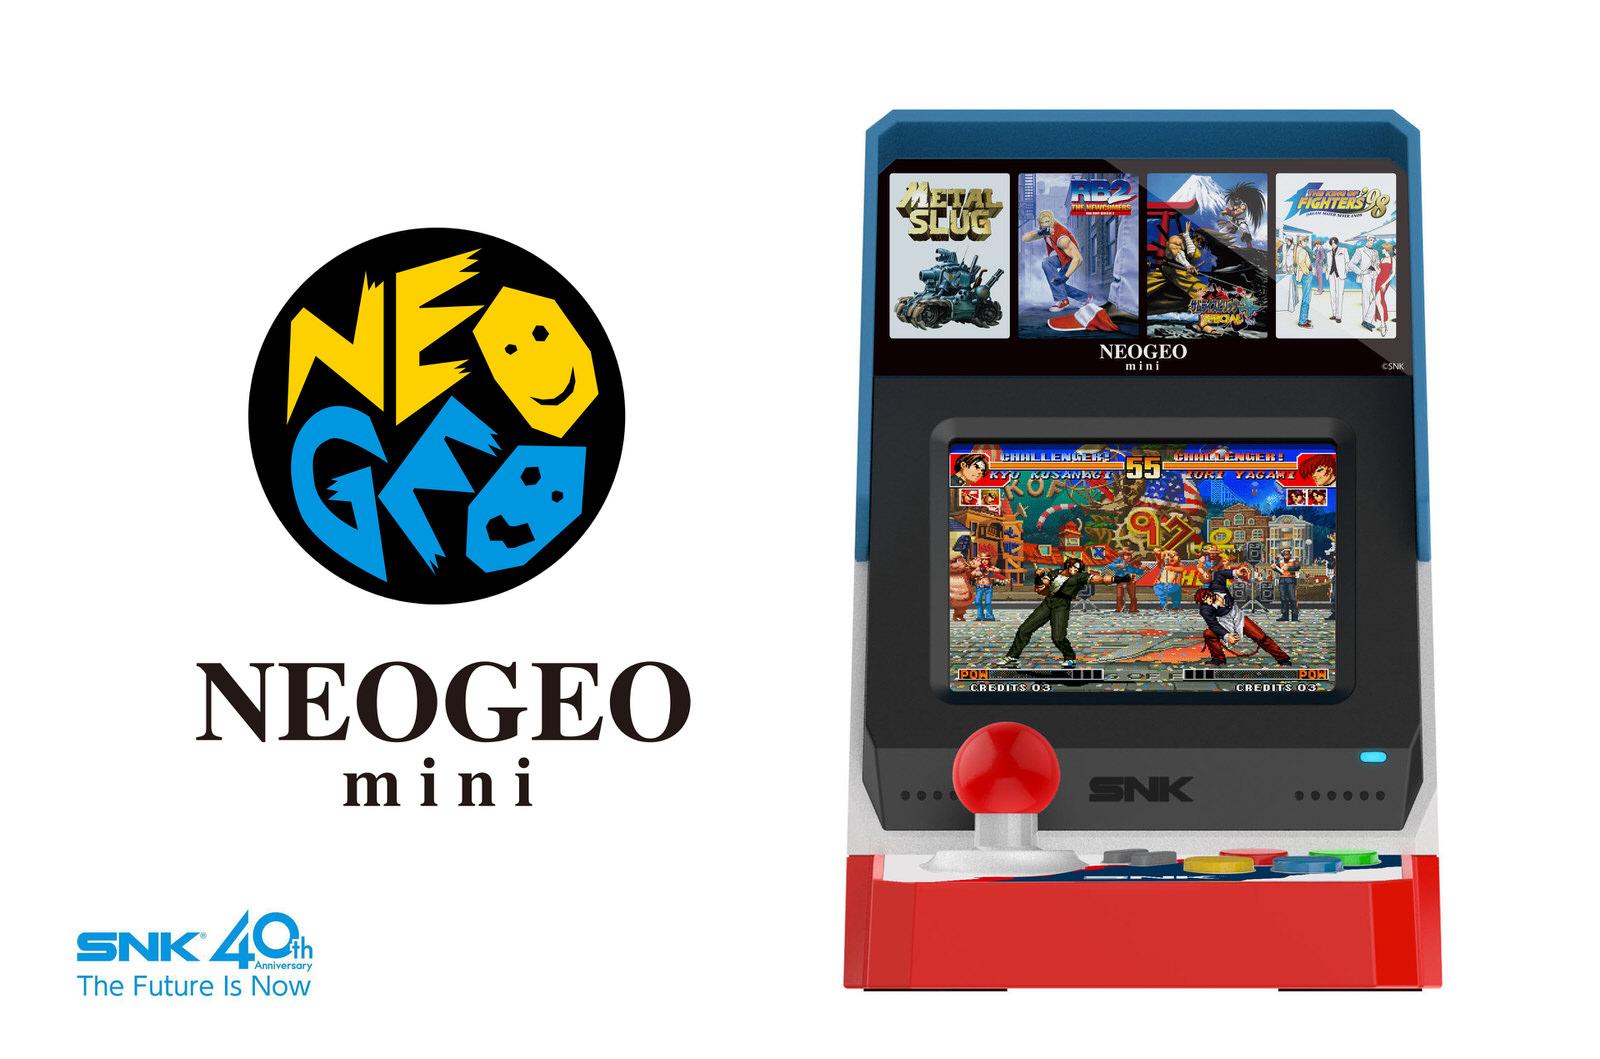 neogeo-mini-5